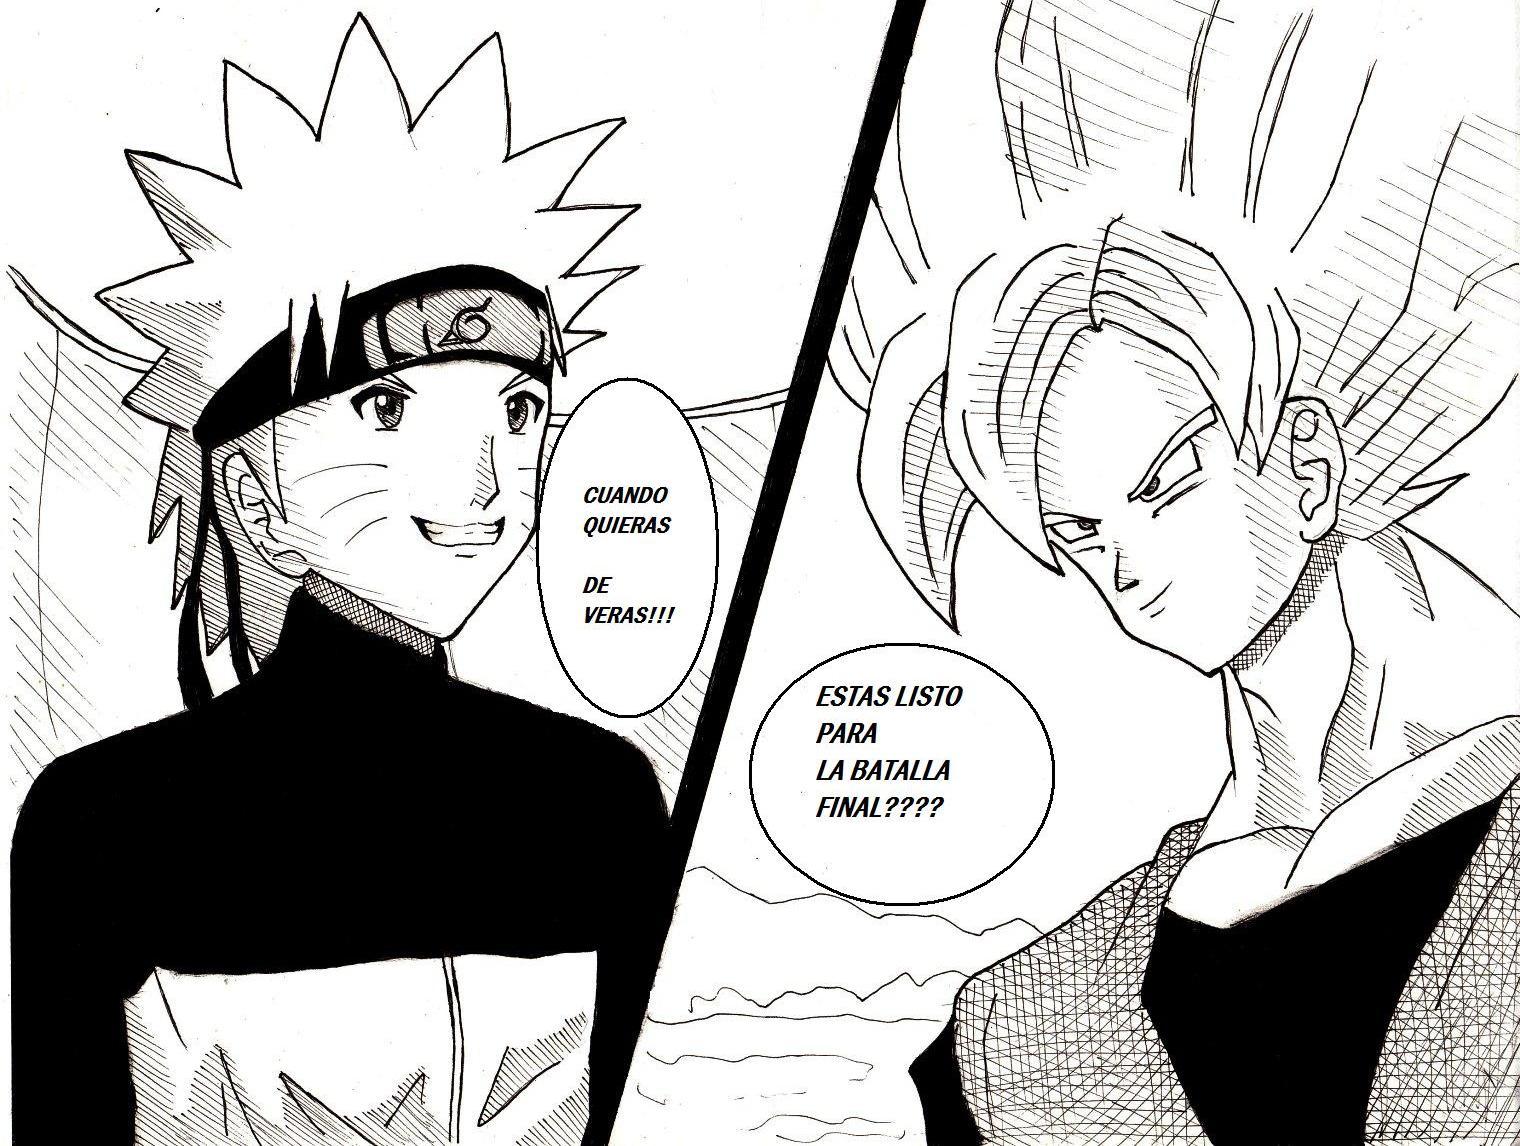 Goku vs Naruto shippuden by Nekoyasha87 on DeviantArt